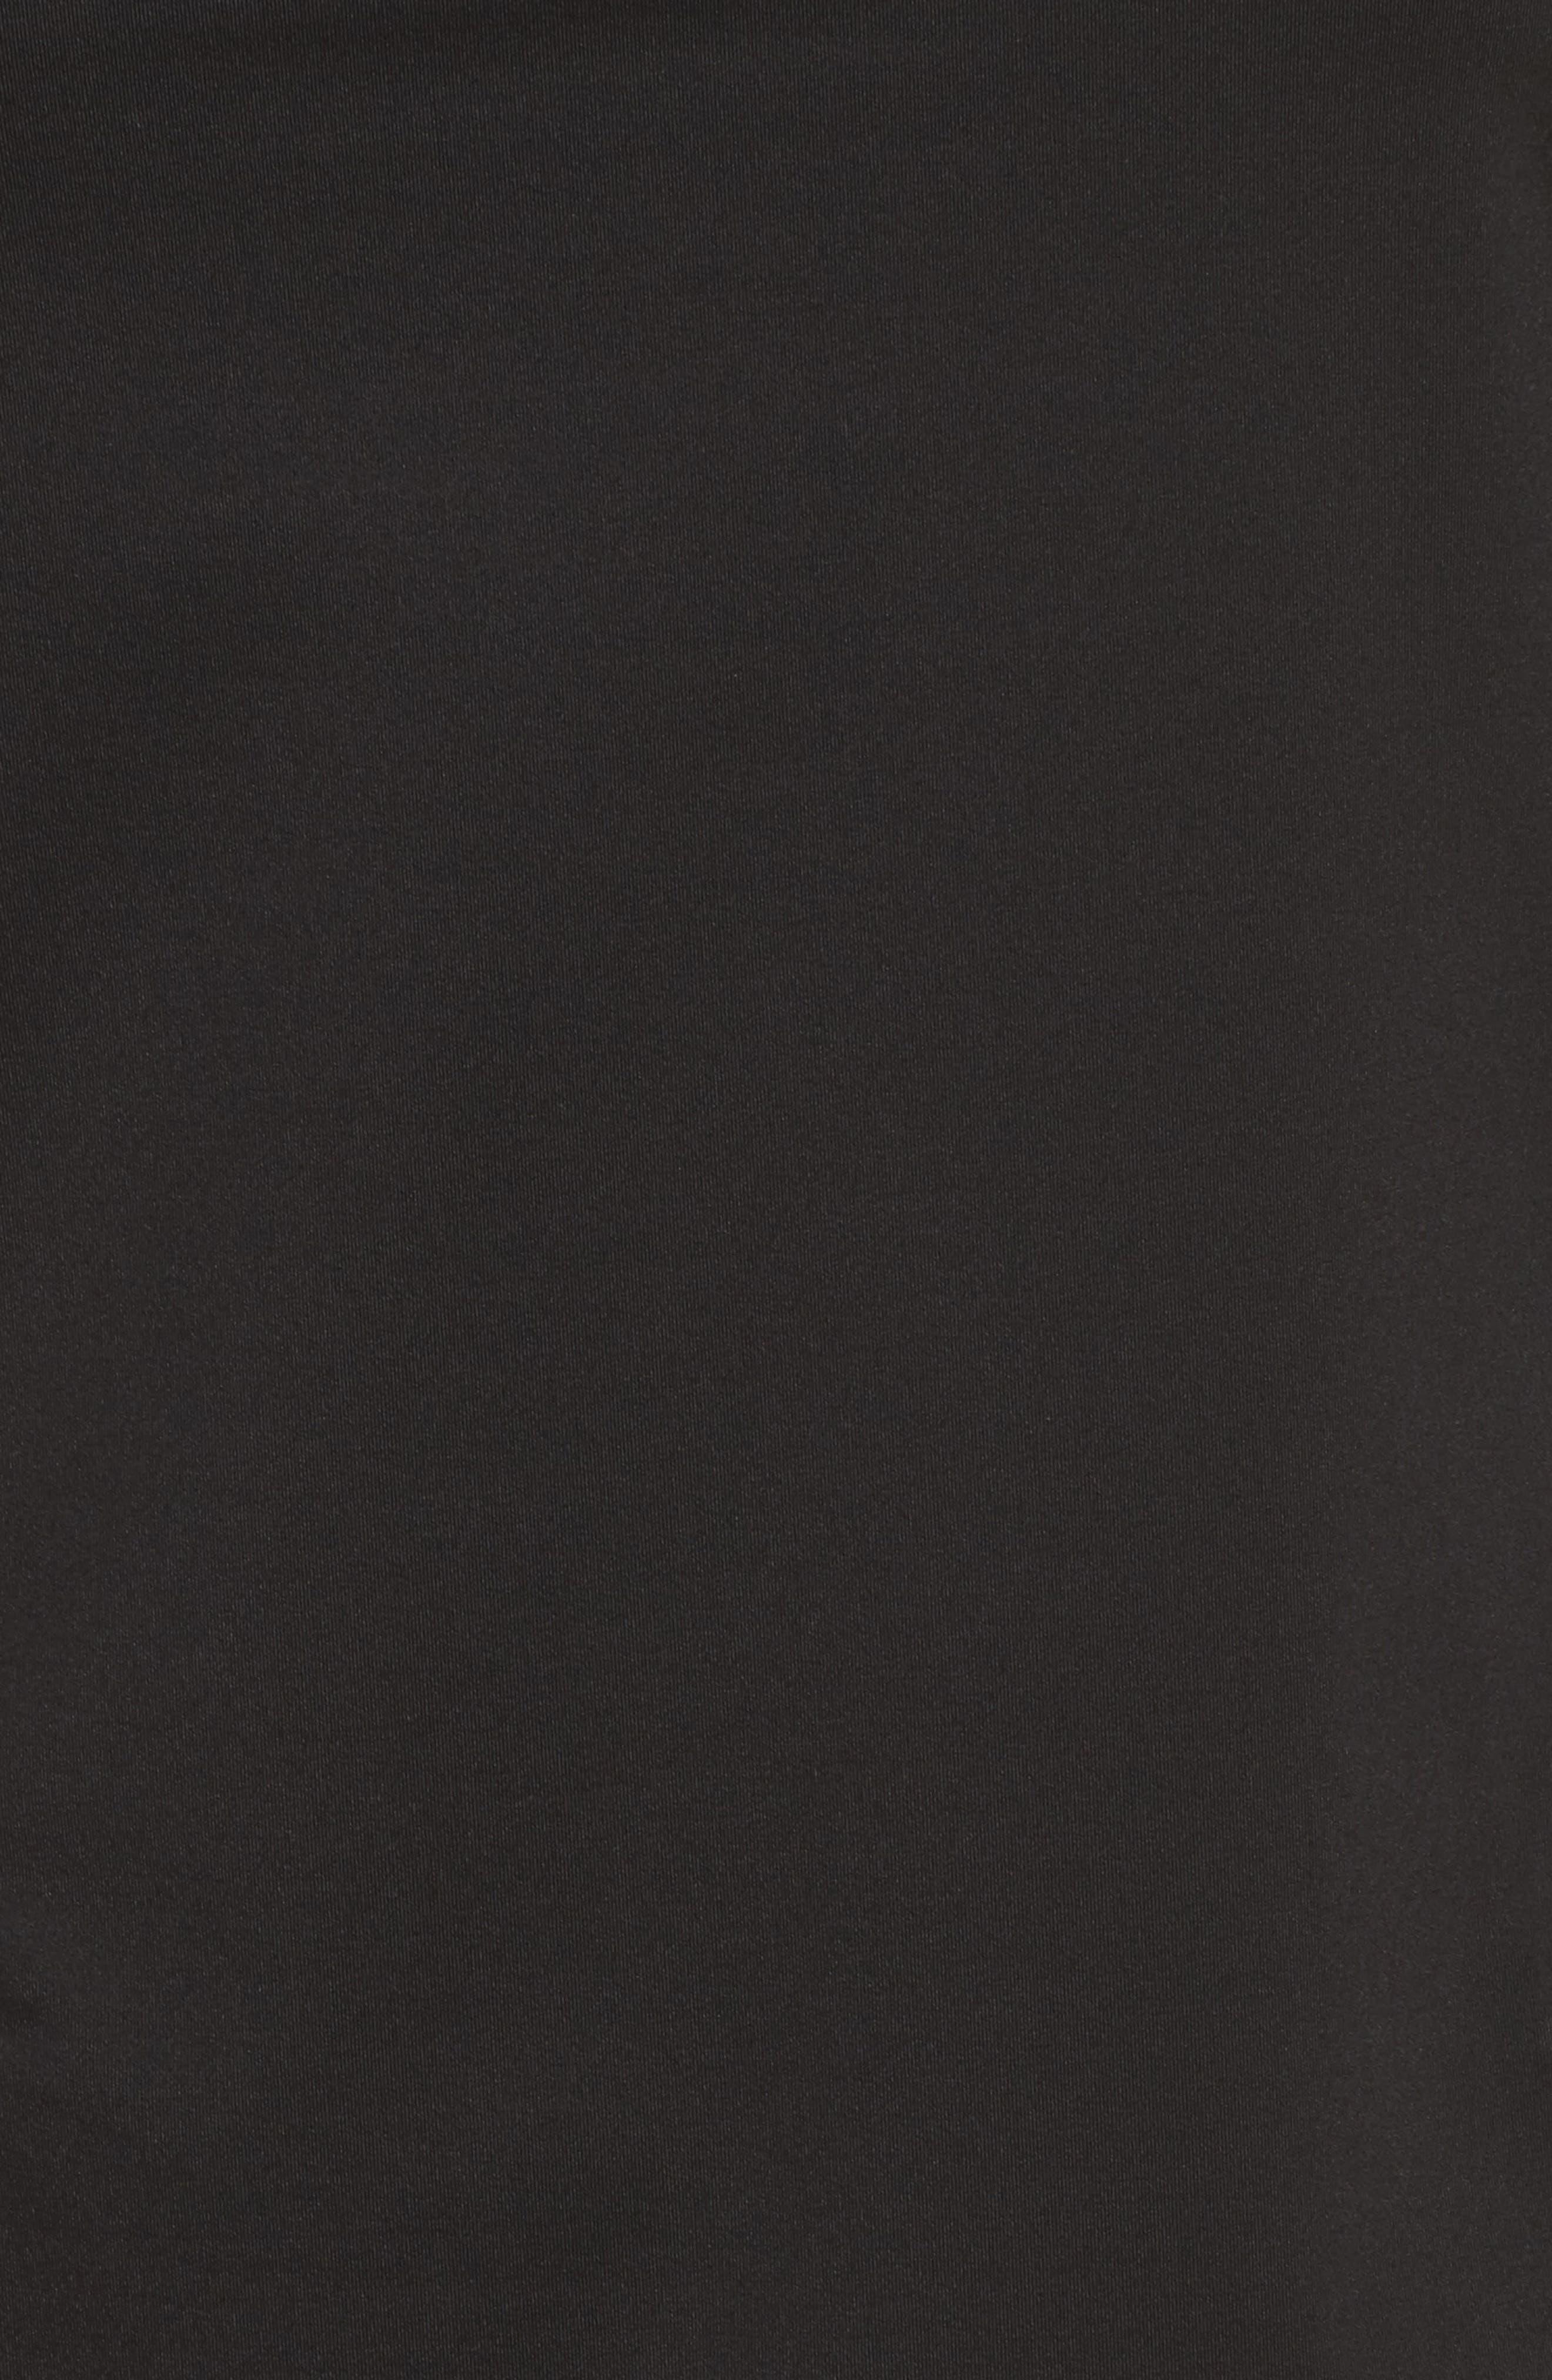 BoomBoom Athletica Mesh Panel Tank,                             Alternate thumbnail 6, color,                             Black/ White